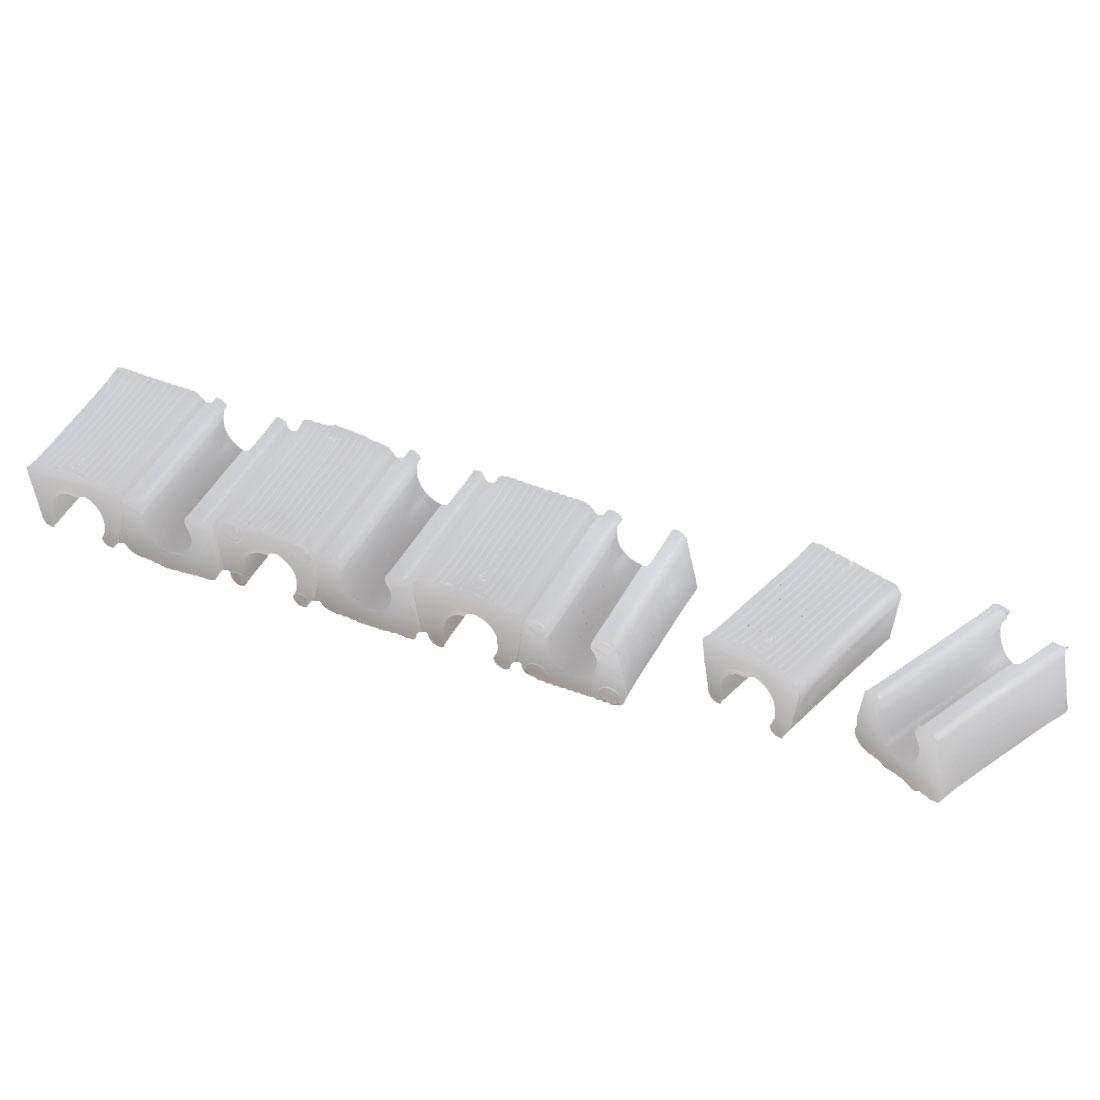 Furniture Chair Foot Plastic Floor Glides Tubing Caps Bungs White 12mm Dia 8 Pcs